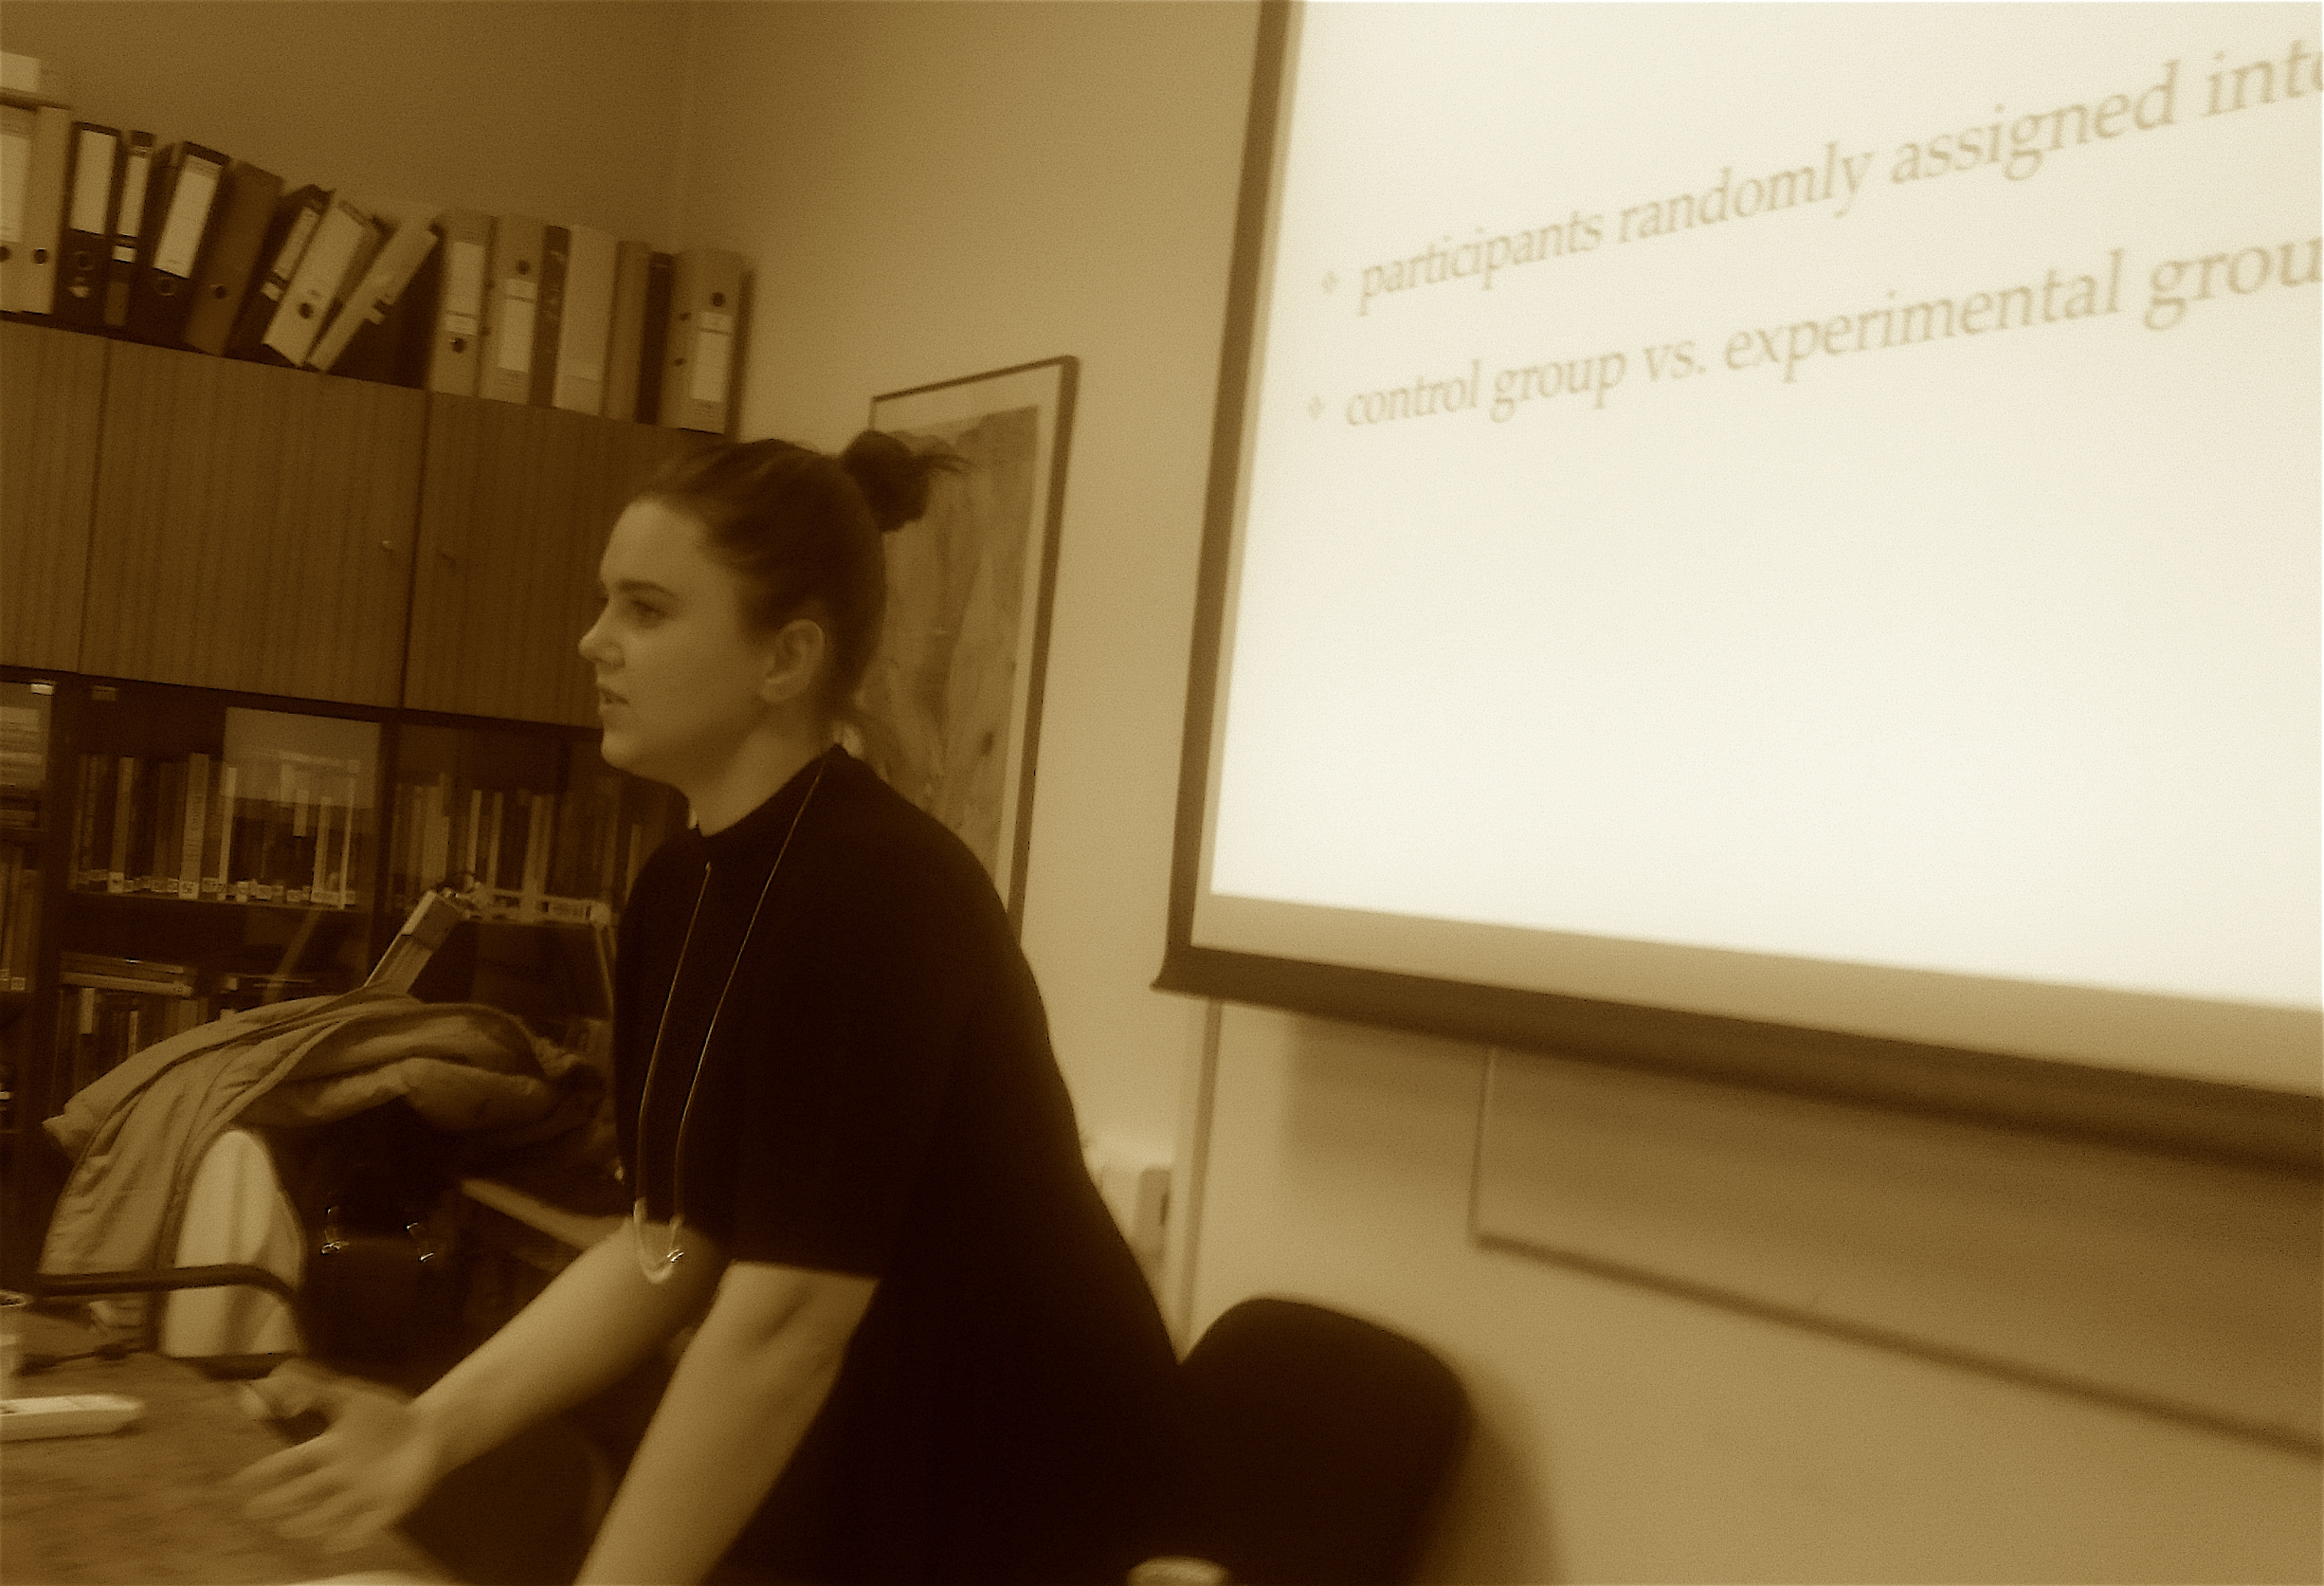 Ana Benje, 20/10/16, Research seminar